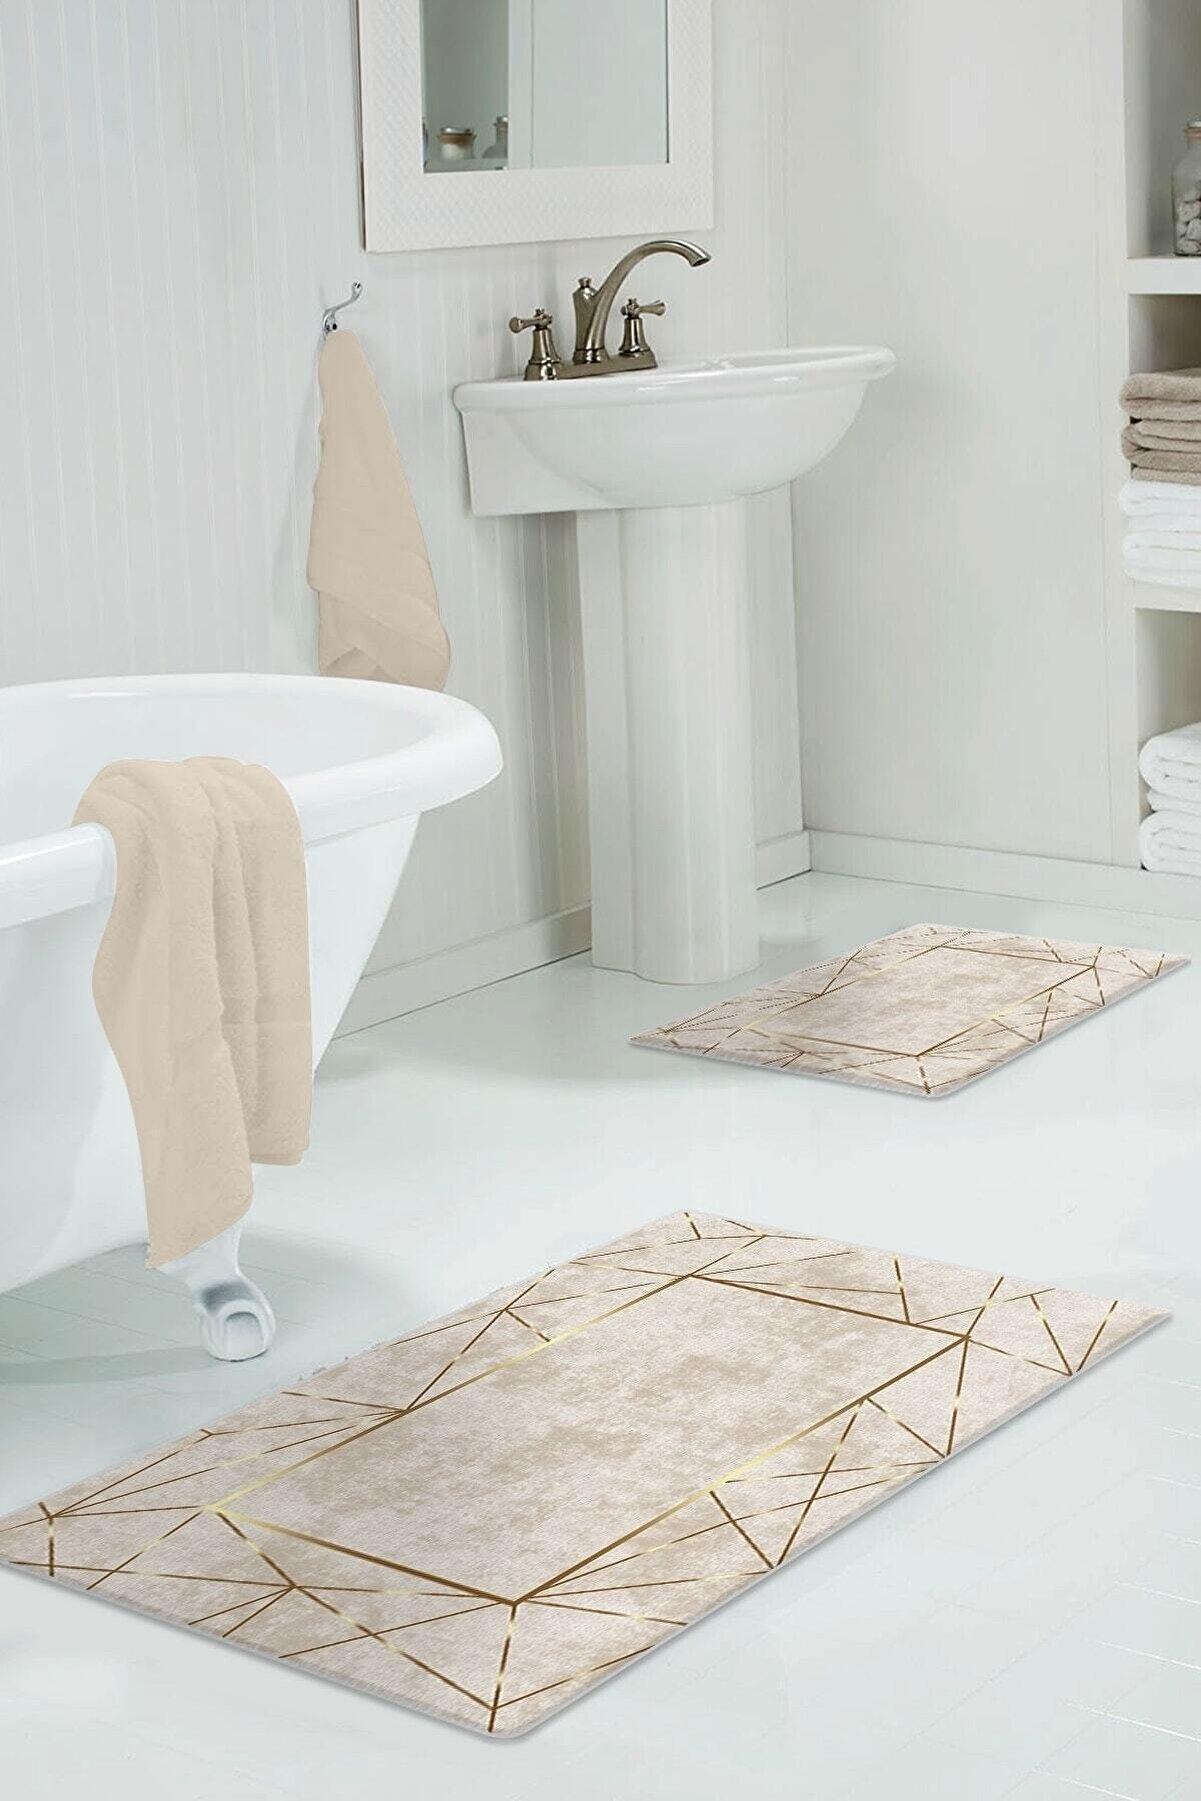 Colizon 60x90 - 50x60 Alya Gold Dijital Banyo Paspası 2'li Klozet Takımı